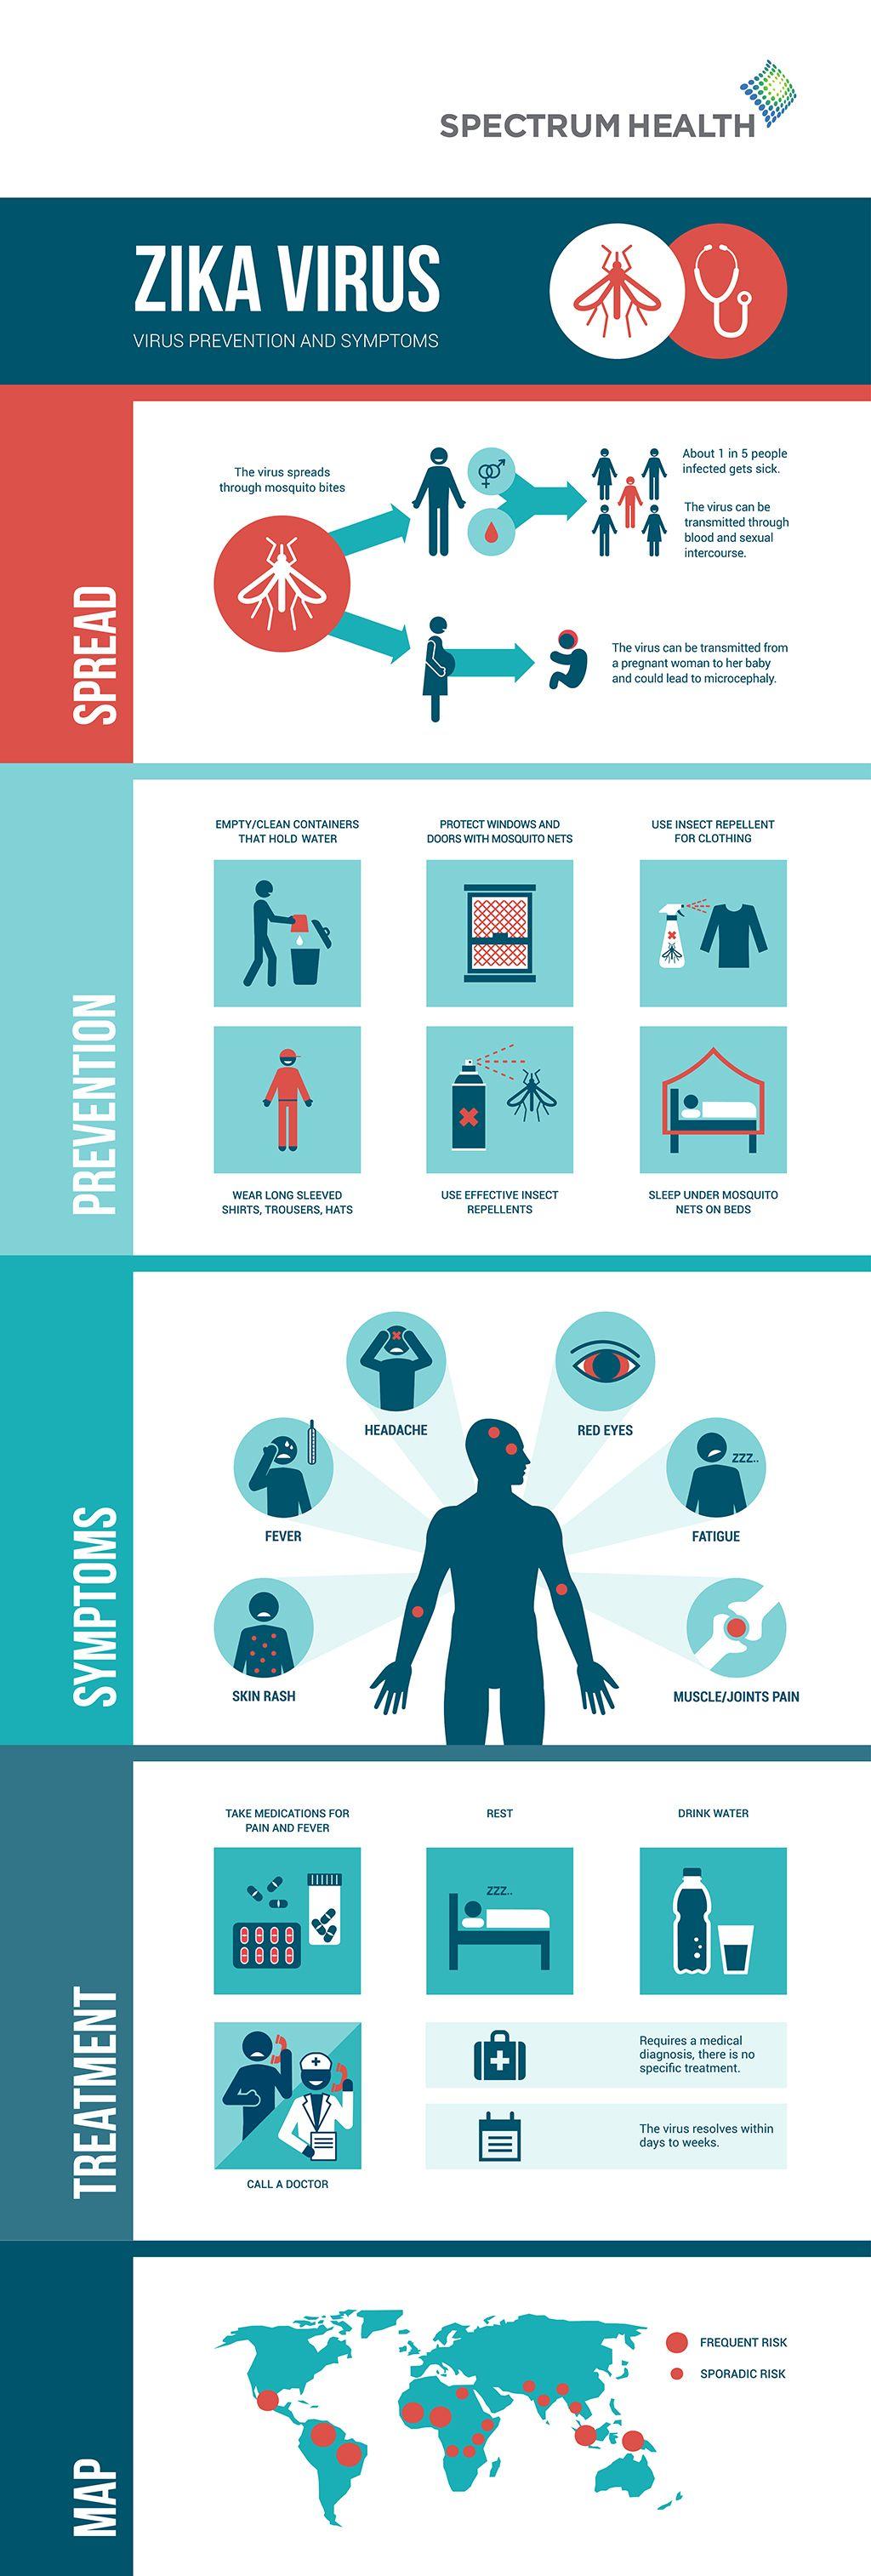 Healthbeat Spectrumhealth Infographics Zika